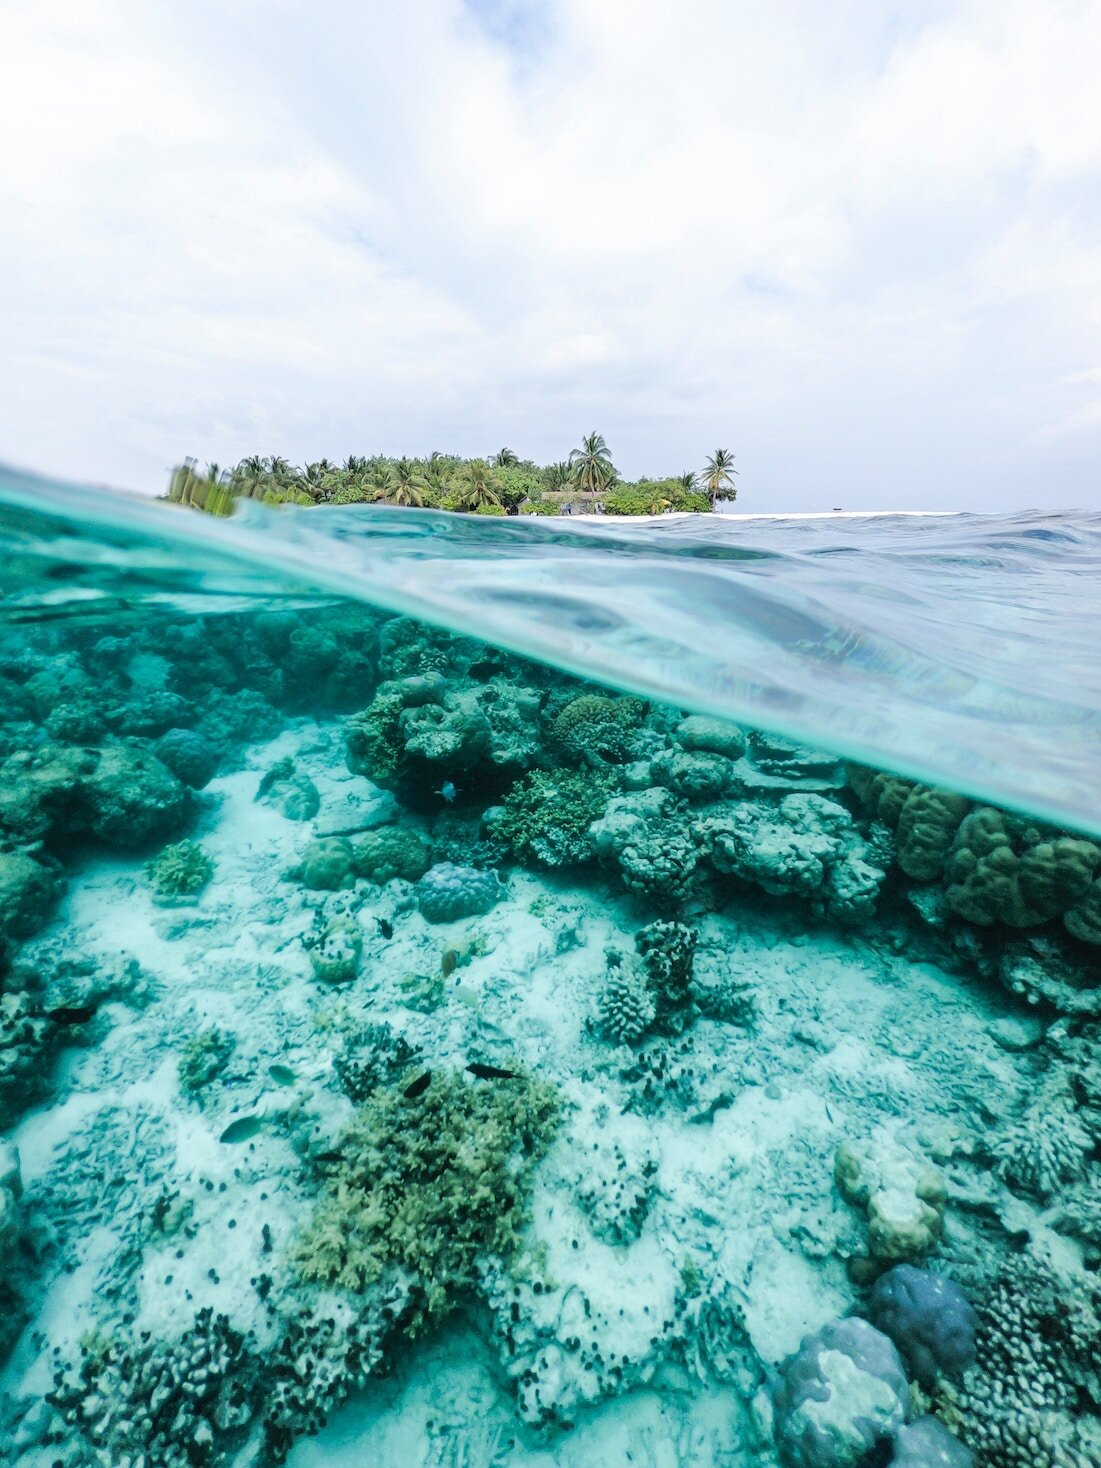 Sustainable ocean environment